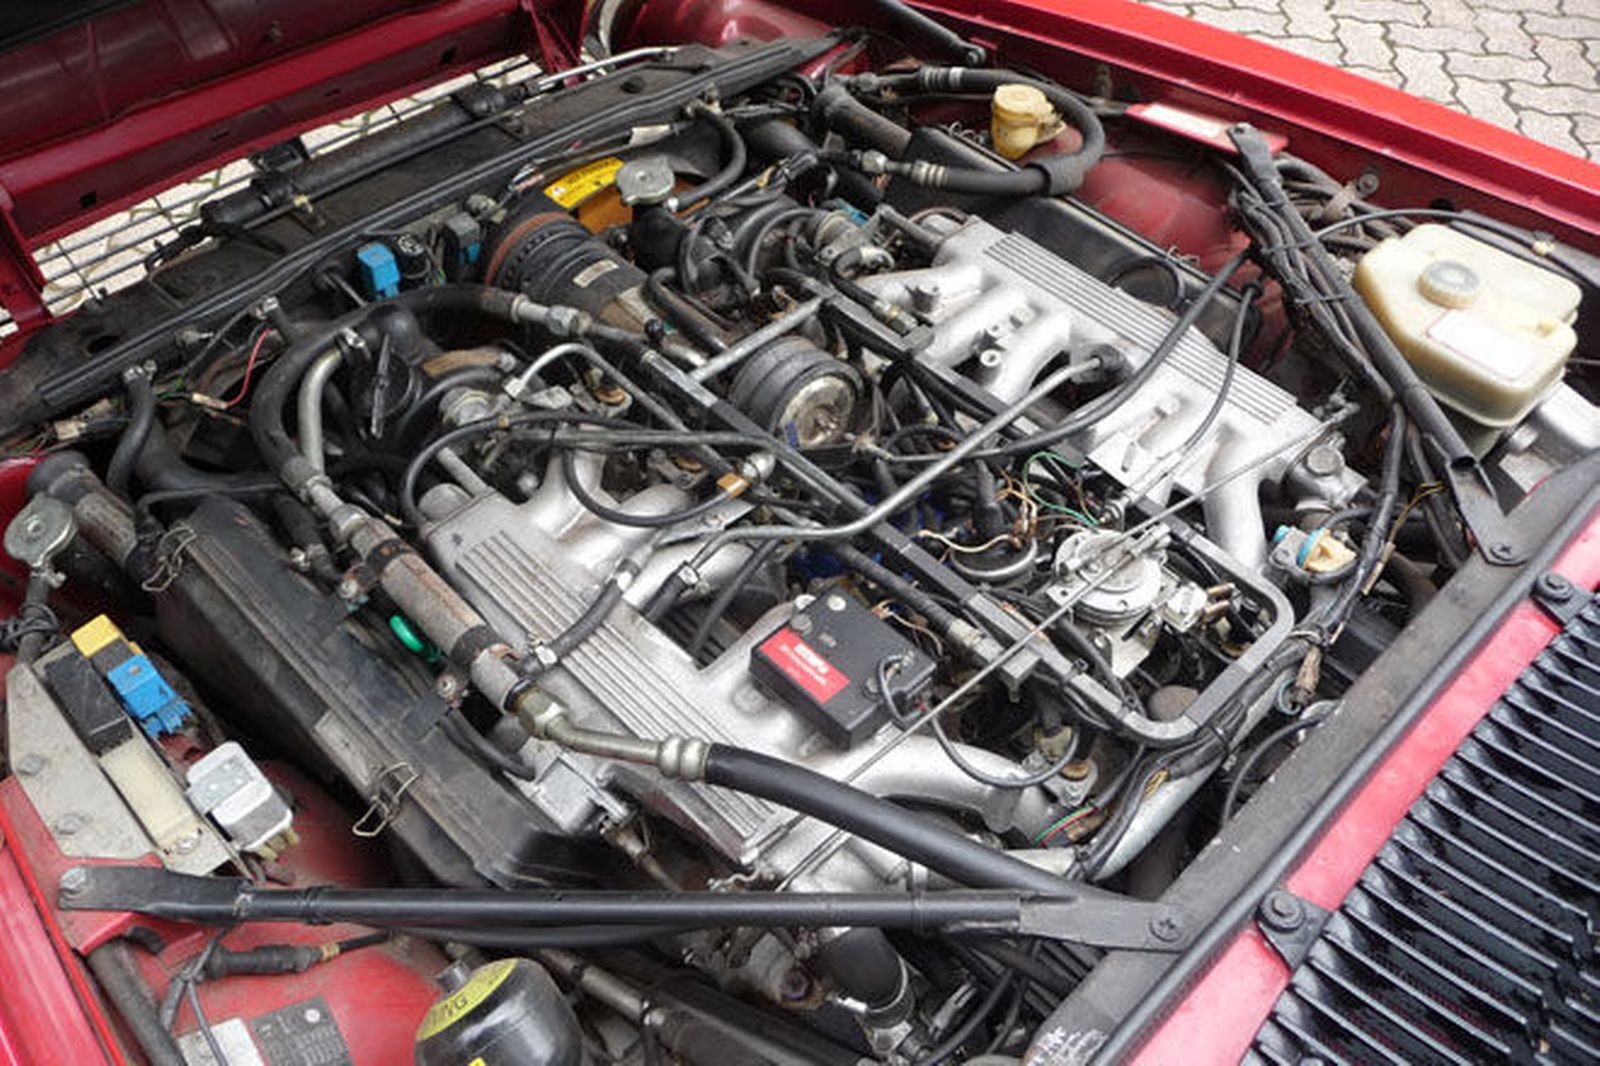 VC_4506] 2005 Jaguar Xj8 Engine Diagram Wiring DiagramLave Feren Para Athid Kweca Hroni Nekout Hendil Mohammedshrine Librar  Wiring 101